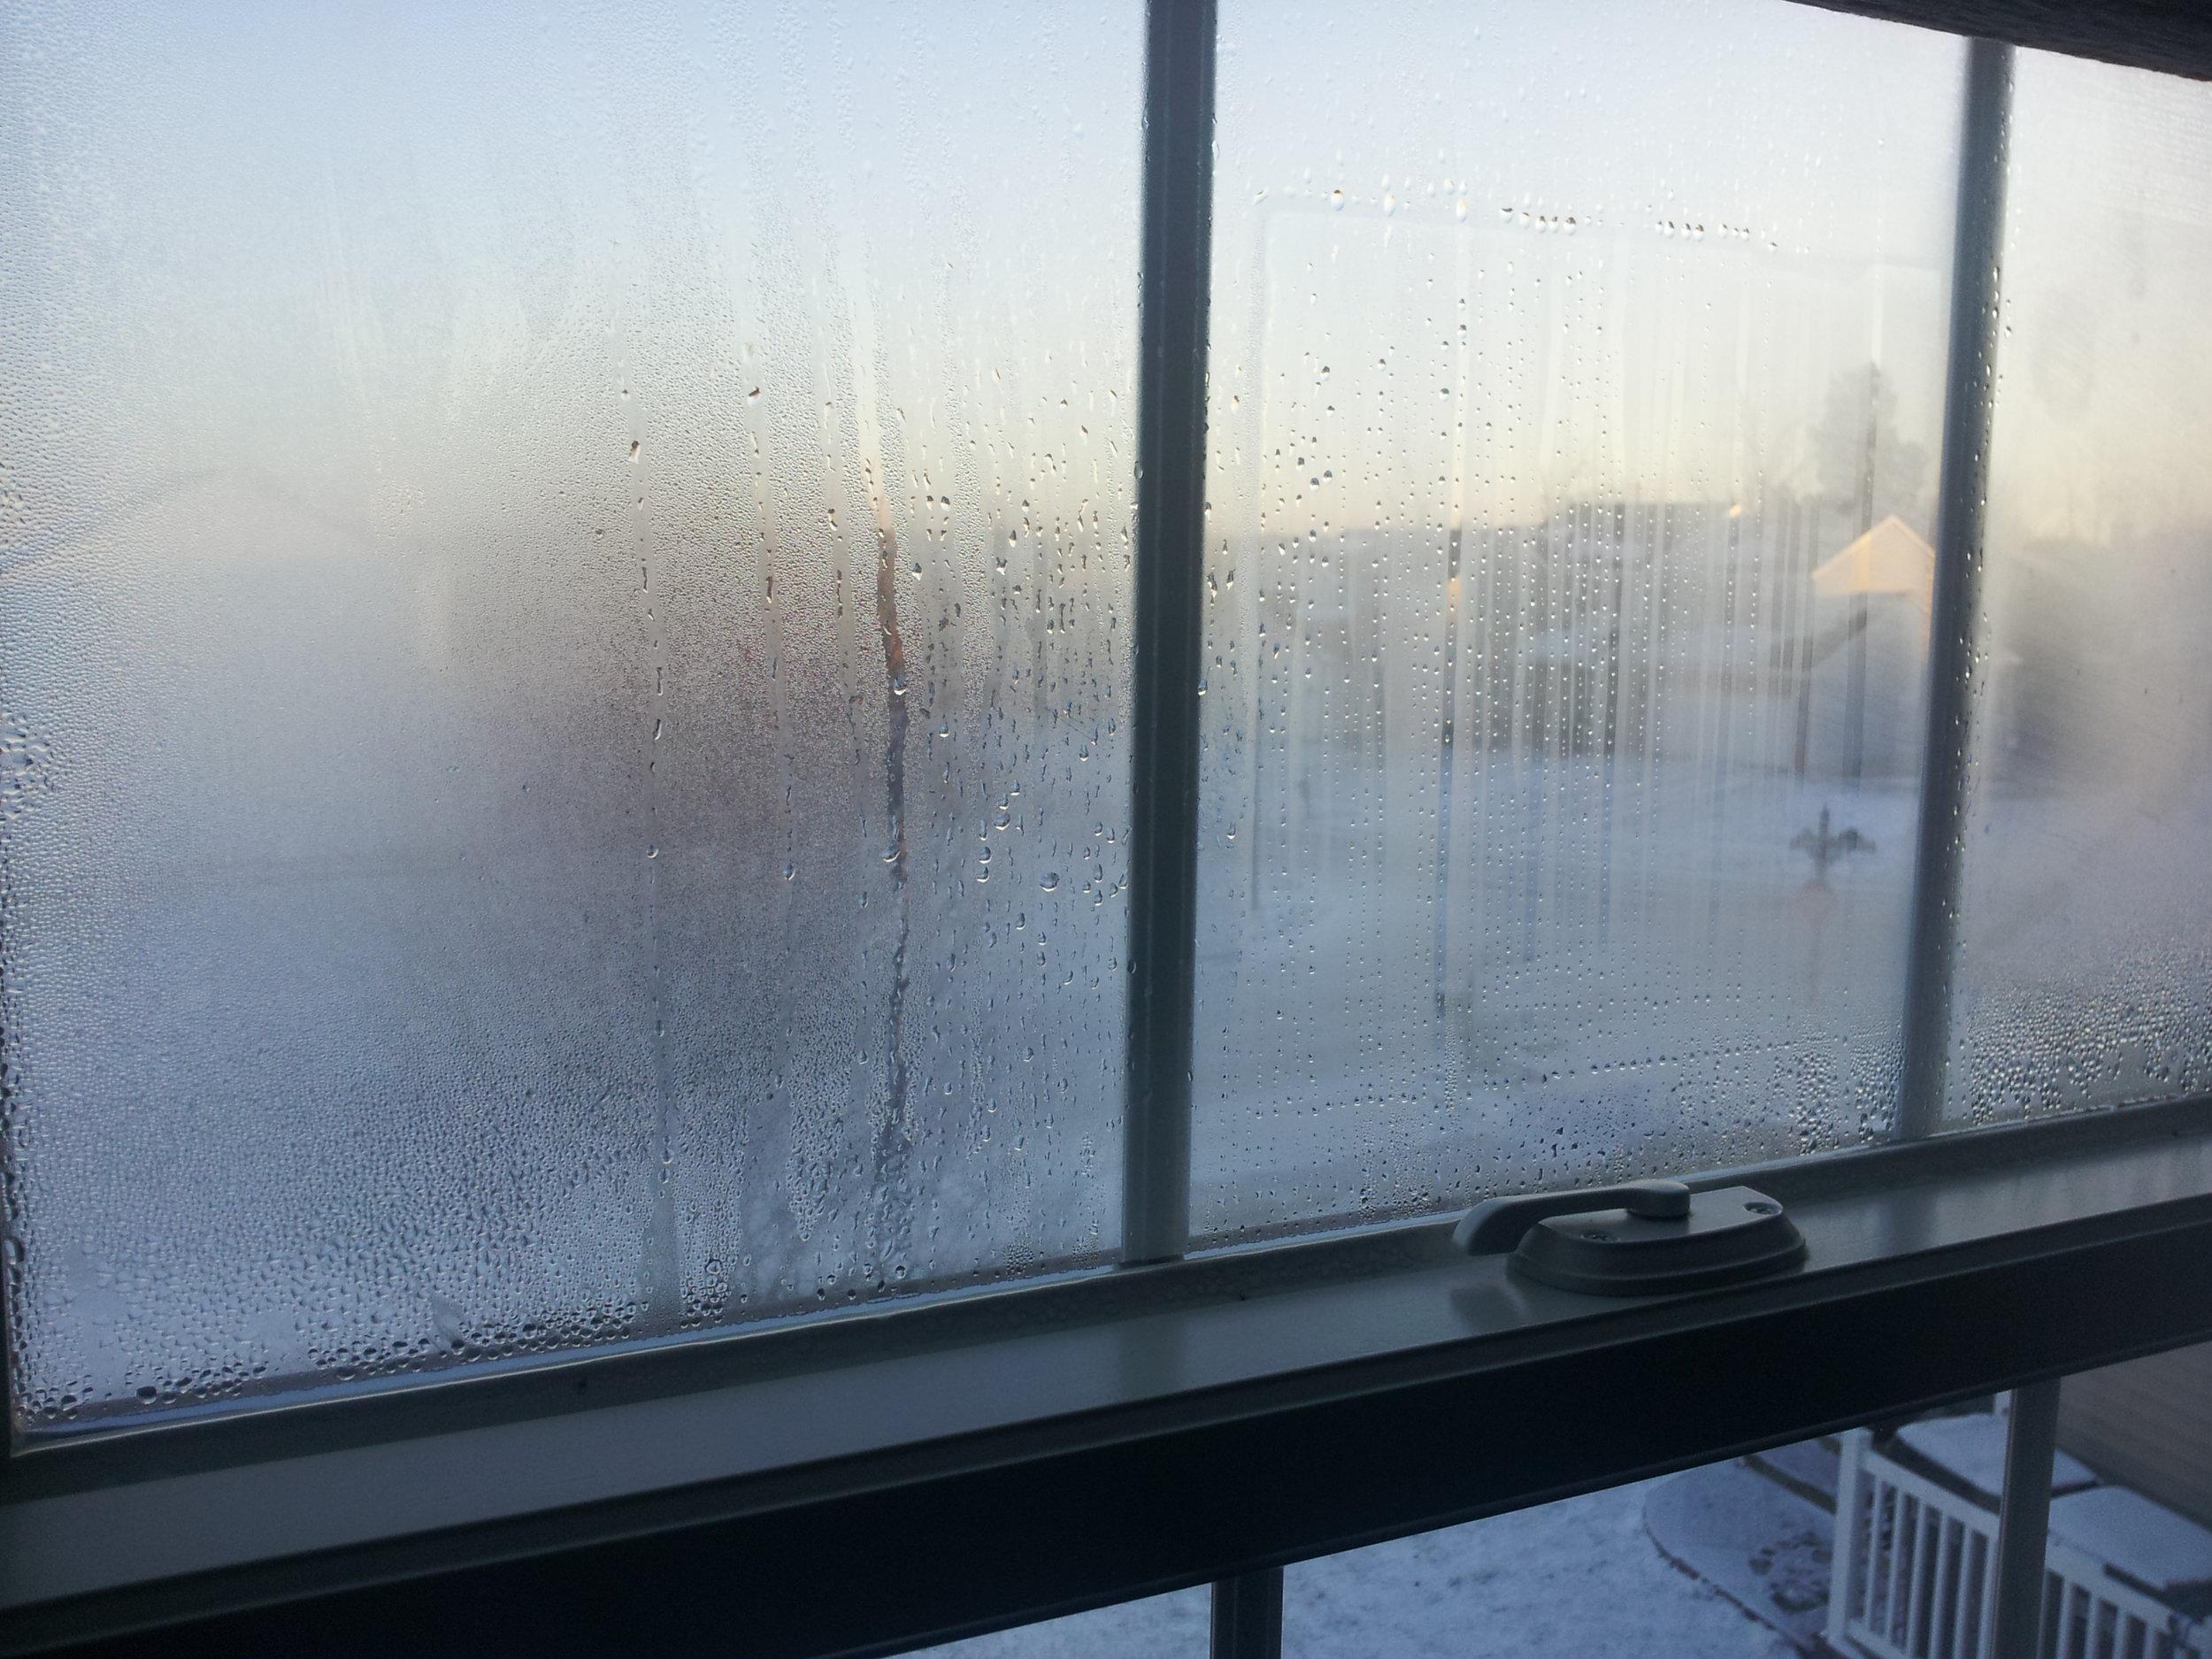 What is Condensation? - Let's first understand condensation.